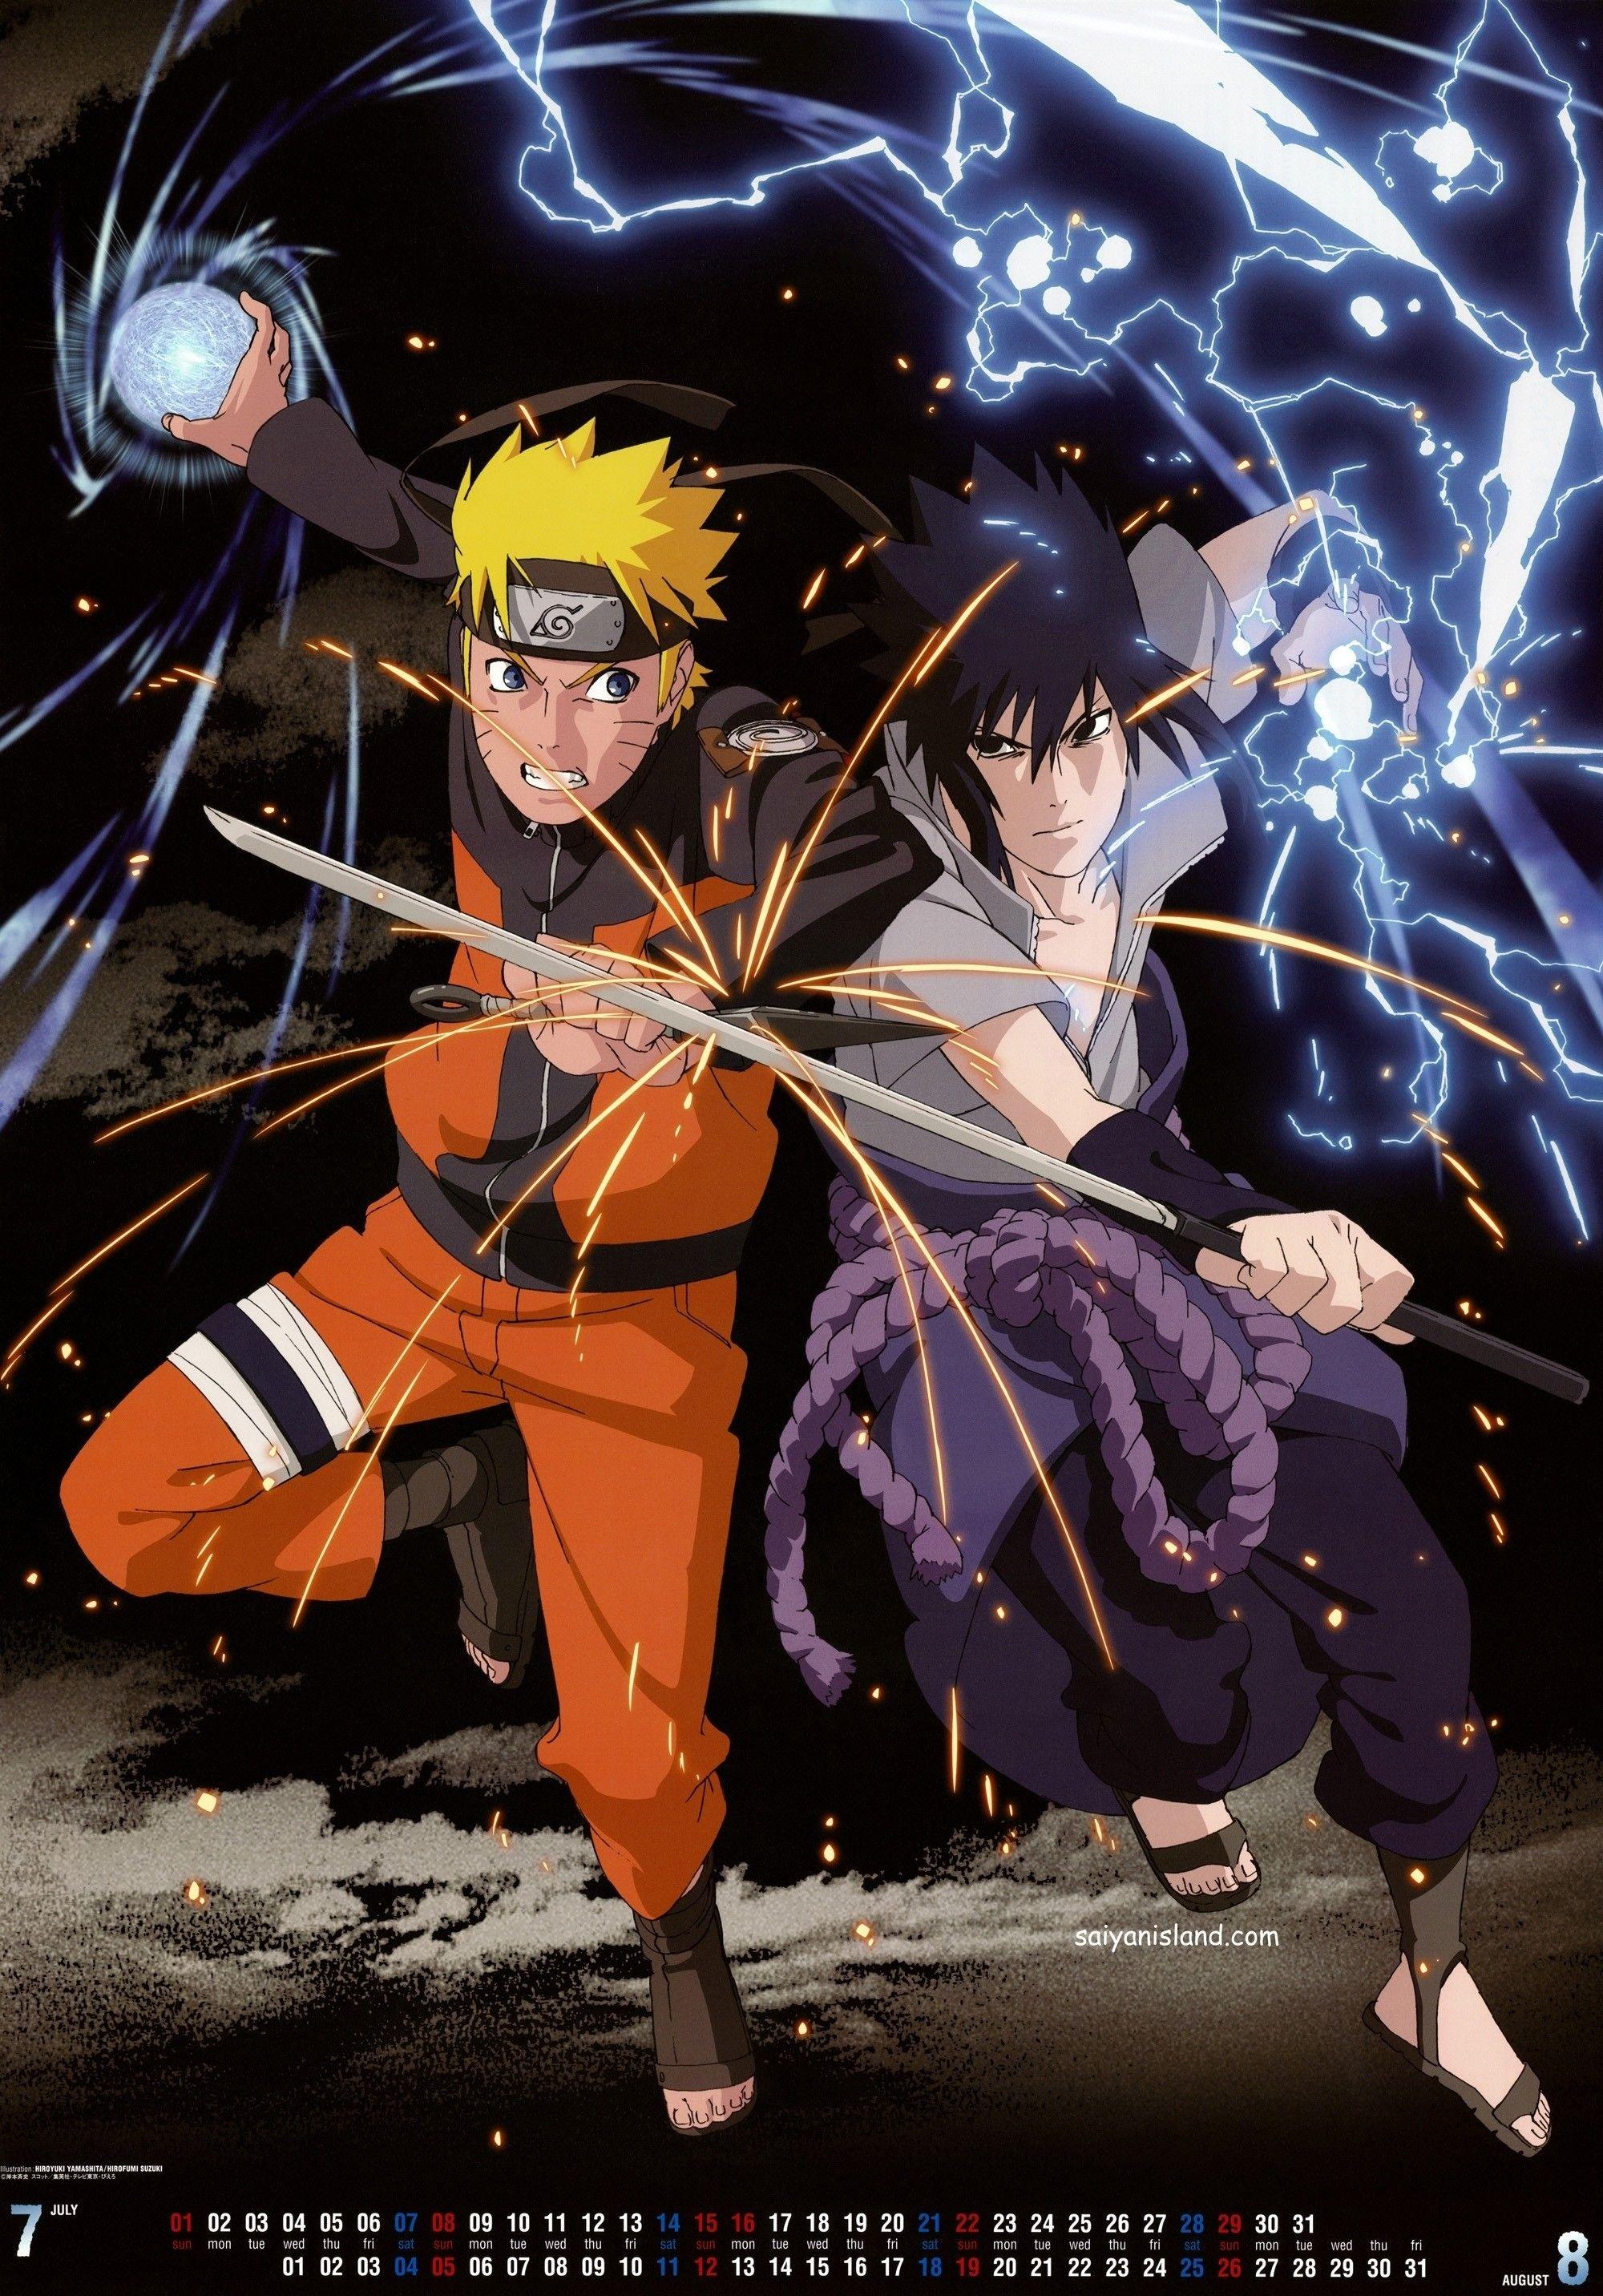 Naruto Vs Sasuke Classico Wallpaper Download Free Naruto Vs Sasuke Wallpaper Desktop Archived Naruto Vs Sasuke Naruto Shippuden Sasuke Naruto Shippuden Anime Coolest naruto and sasuke wallpapers